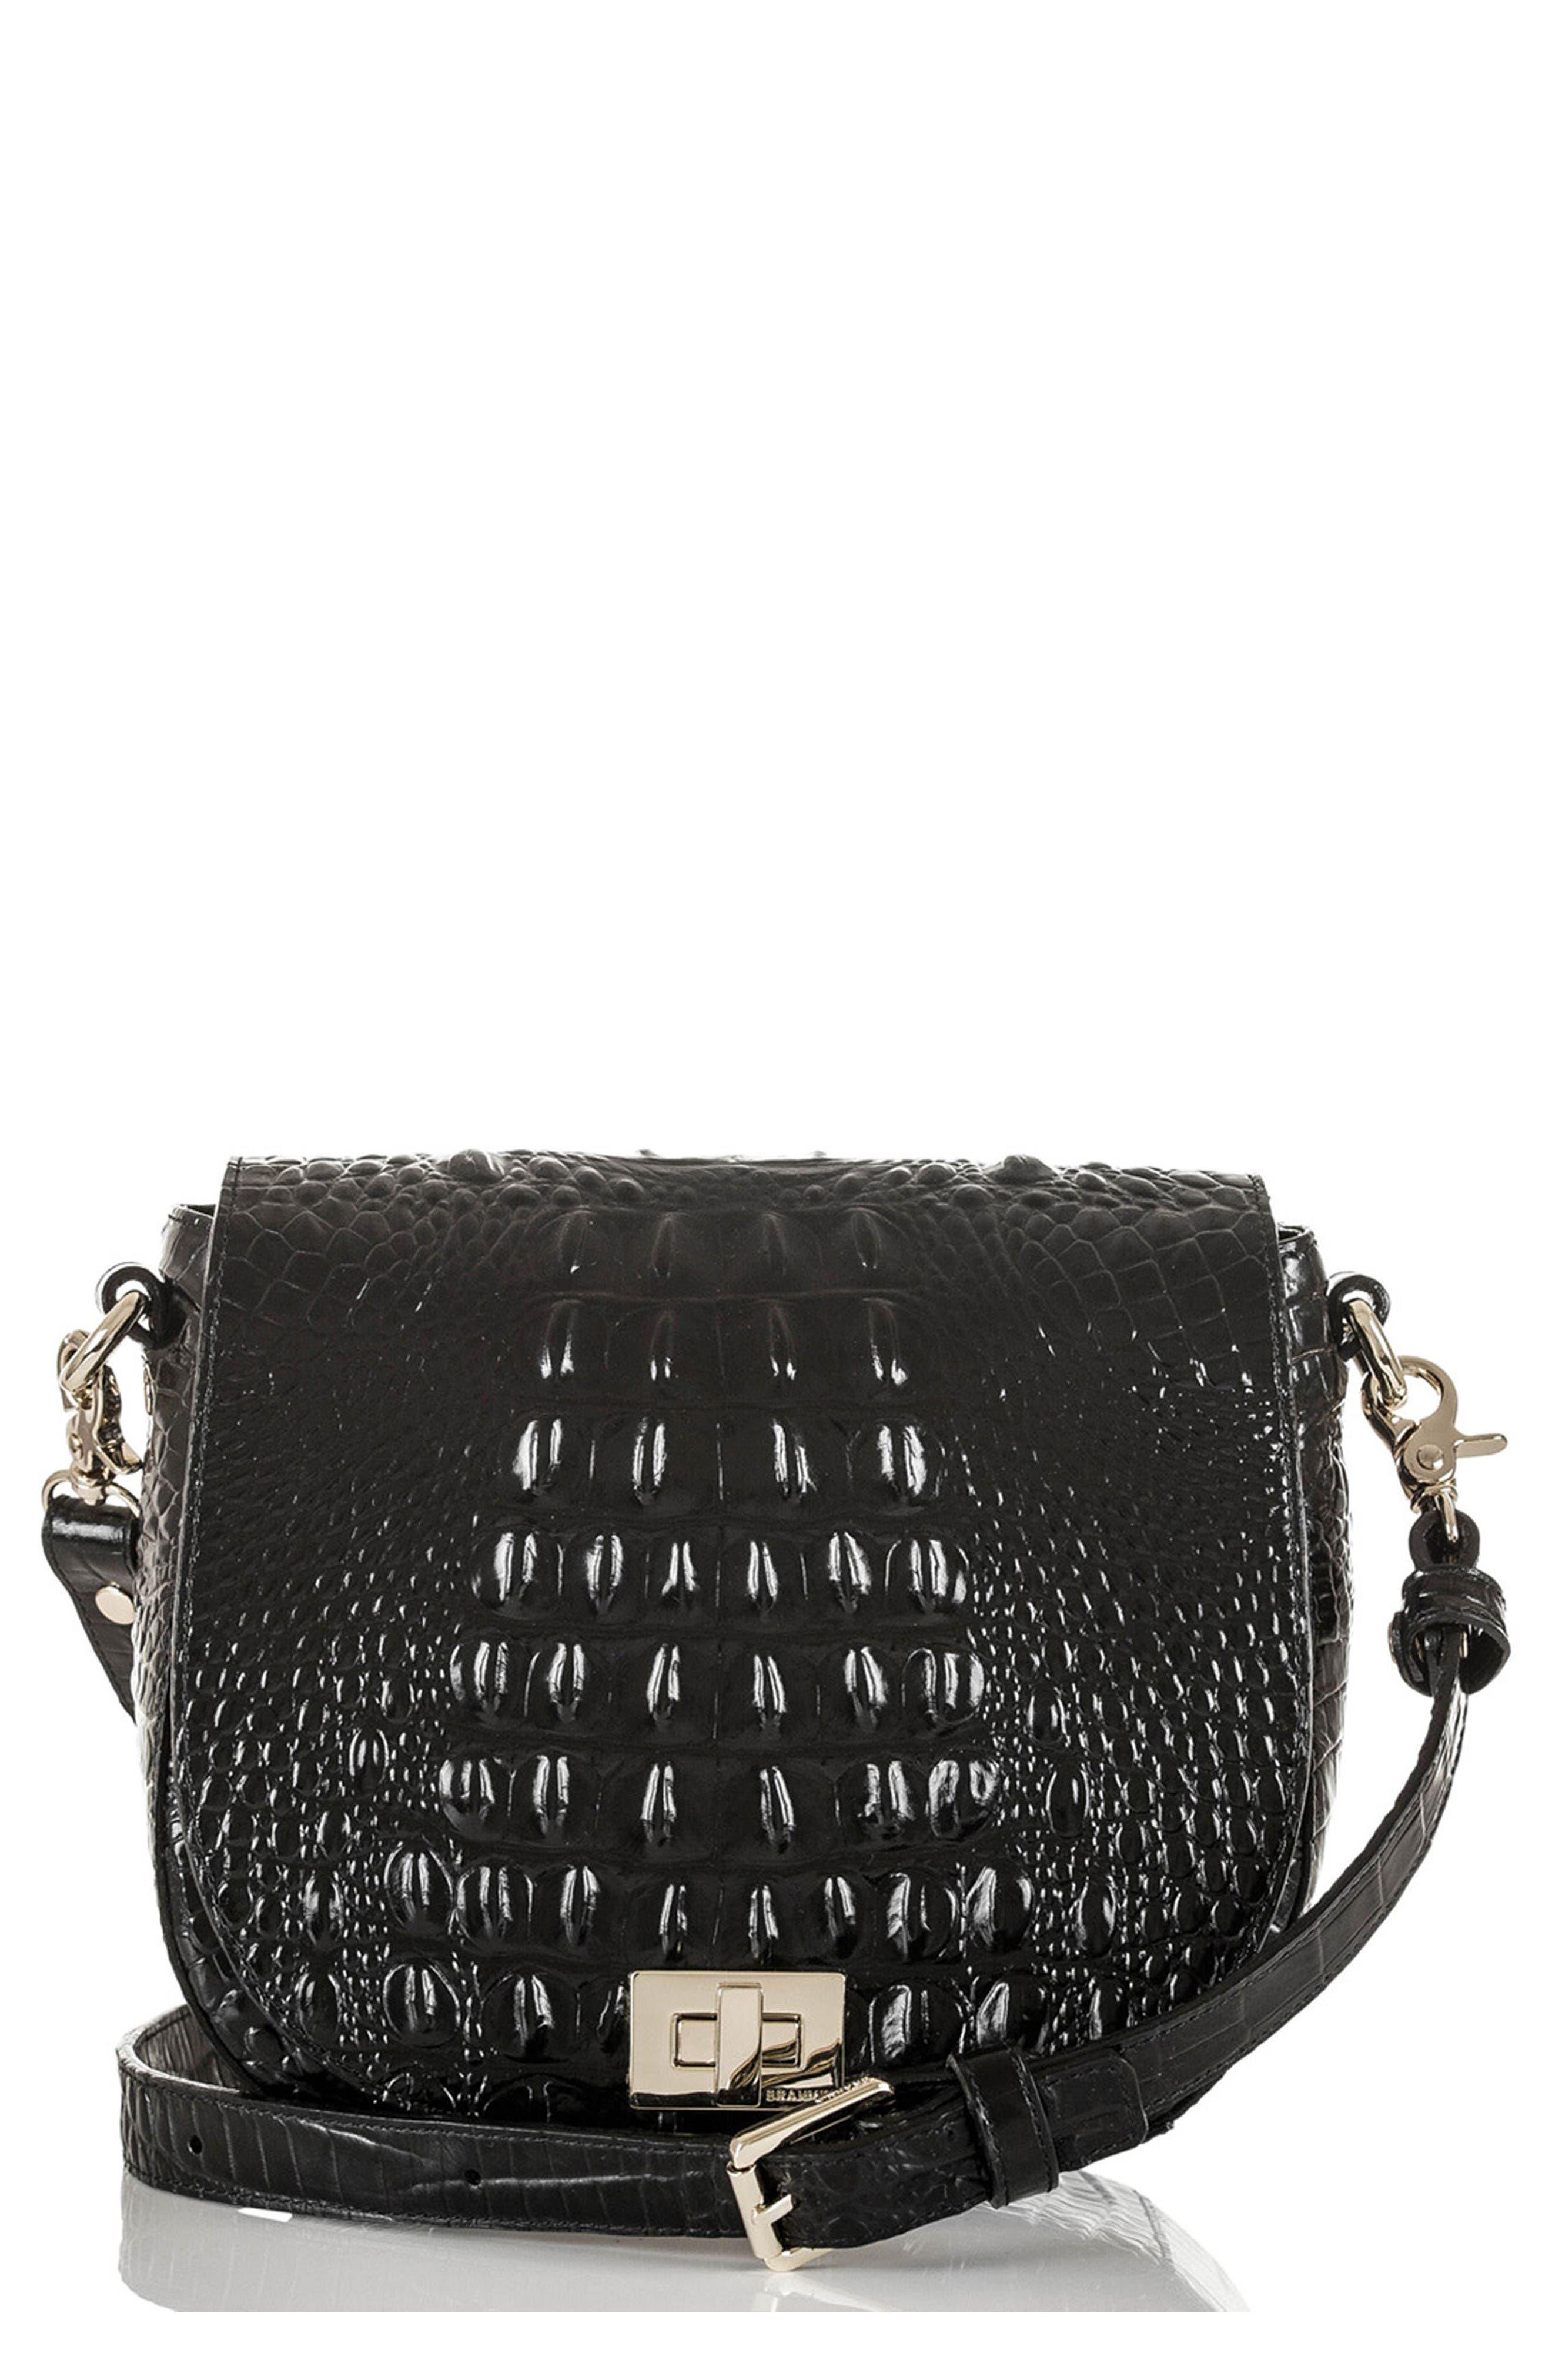 Brahmin Mini Sonny Leather Crossbody Bag